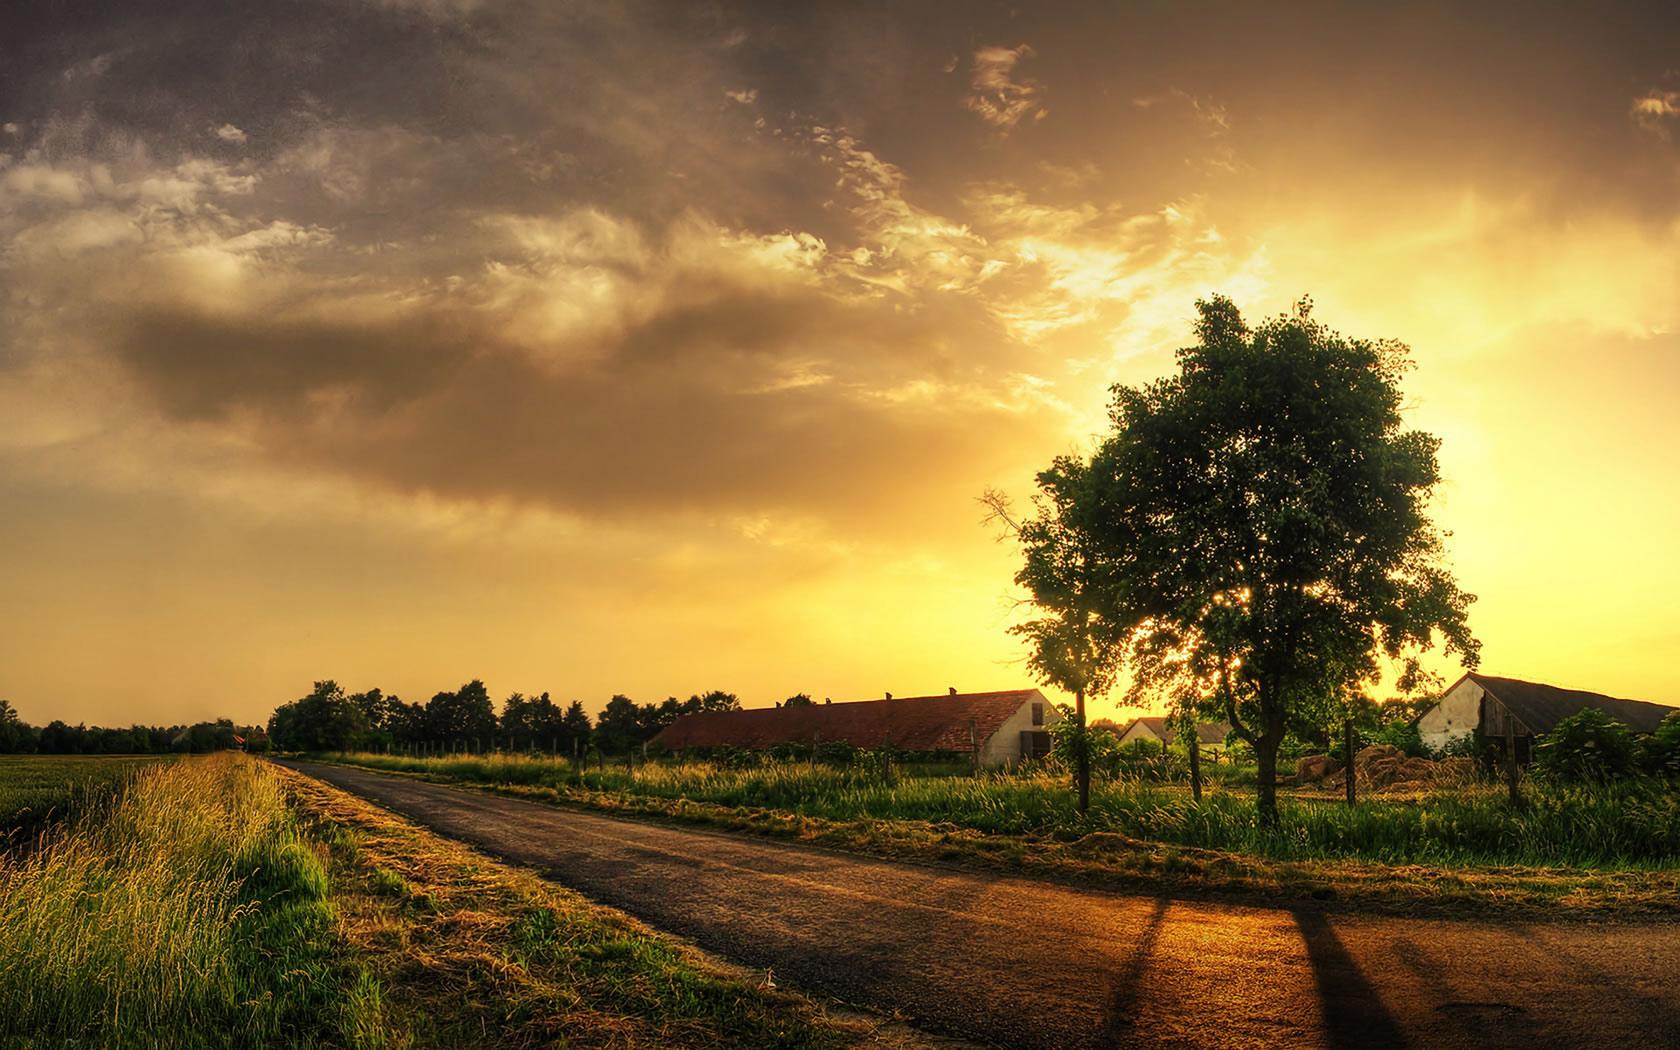 Stunning Landscape Sunset